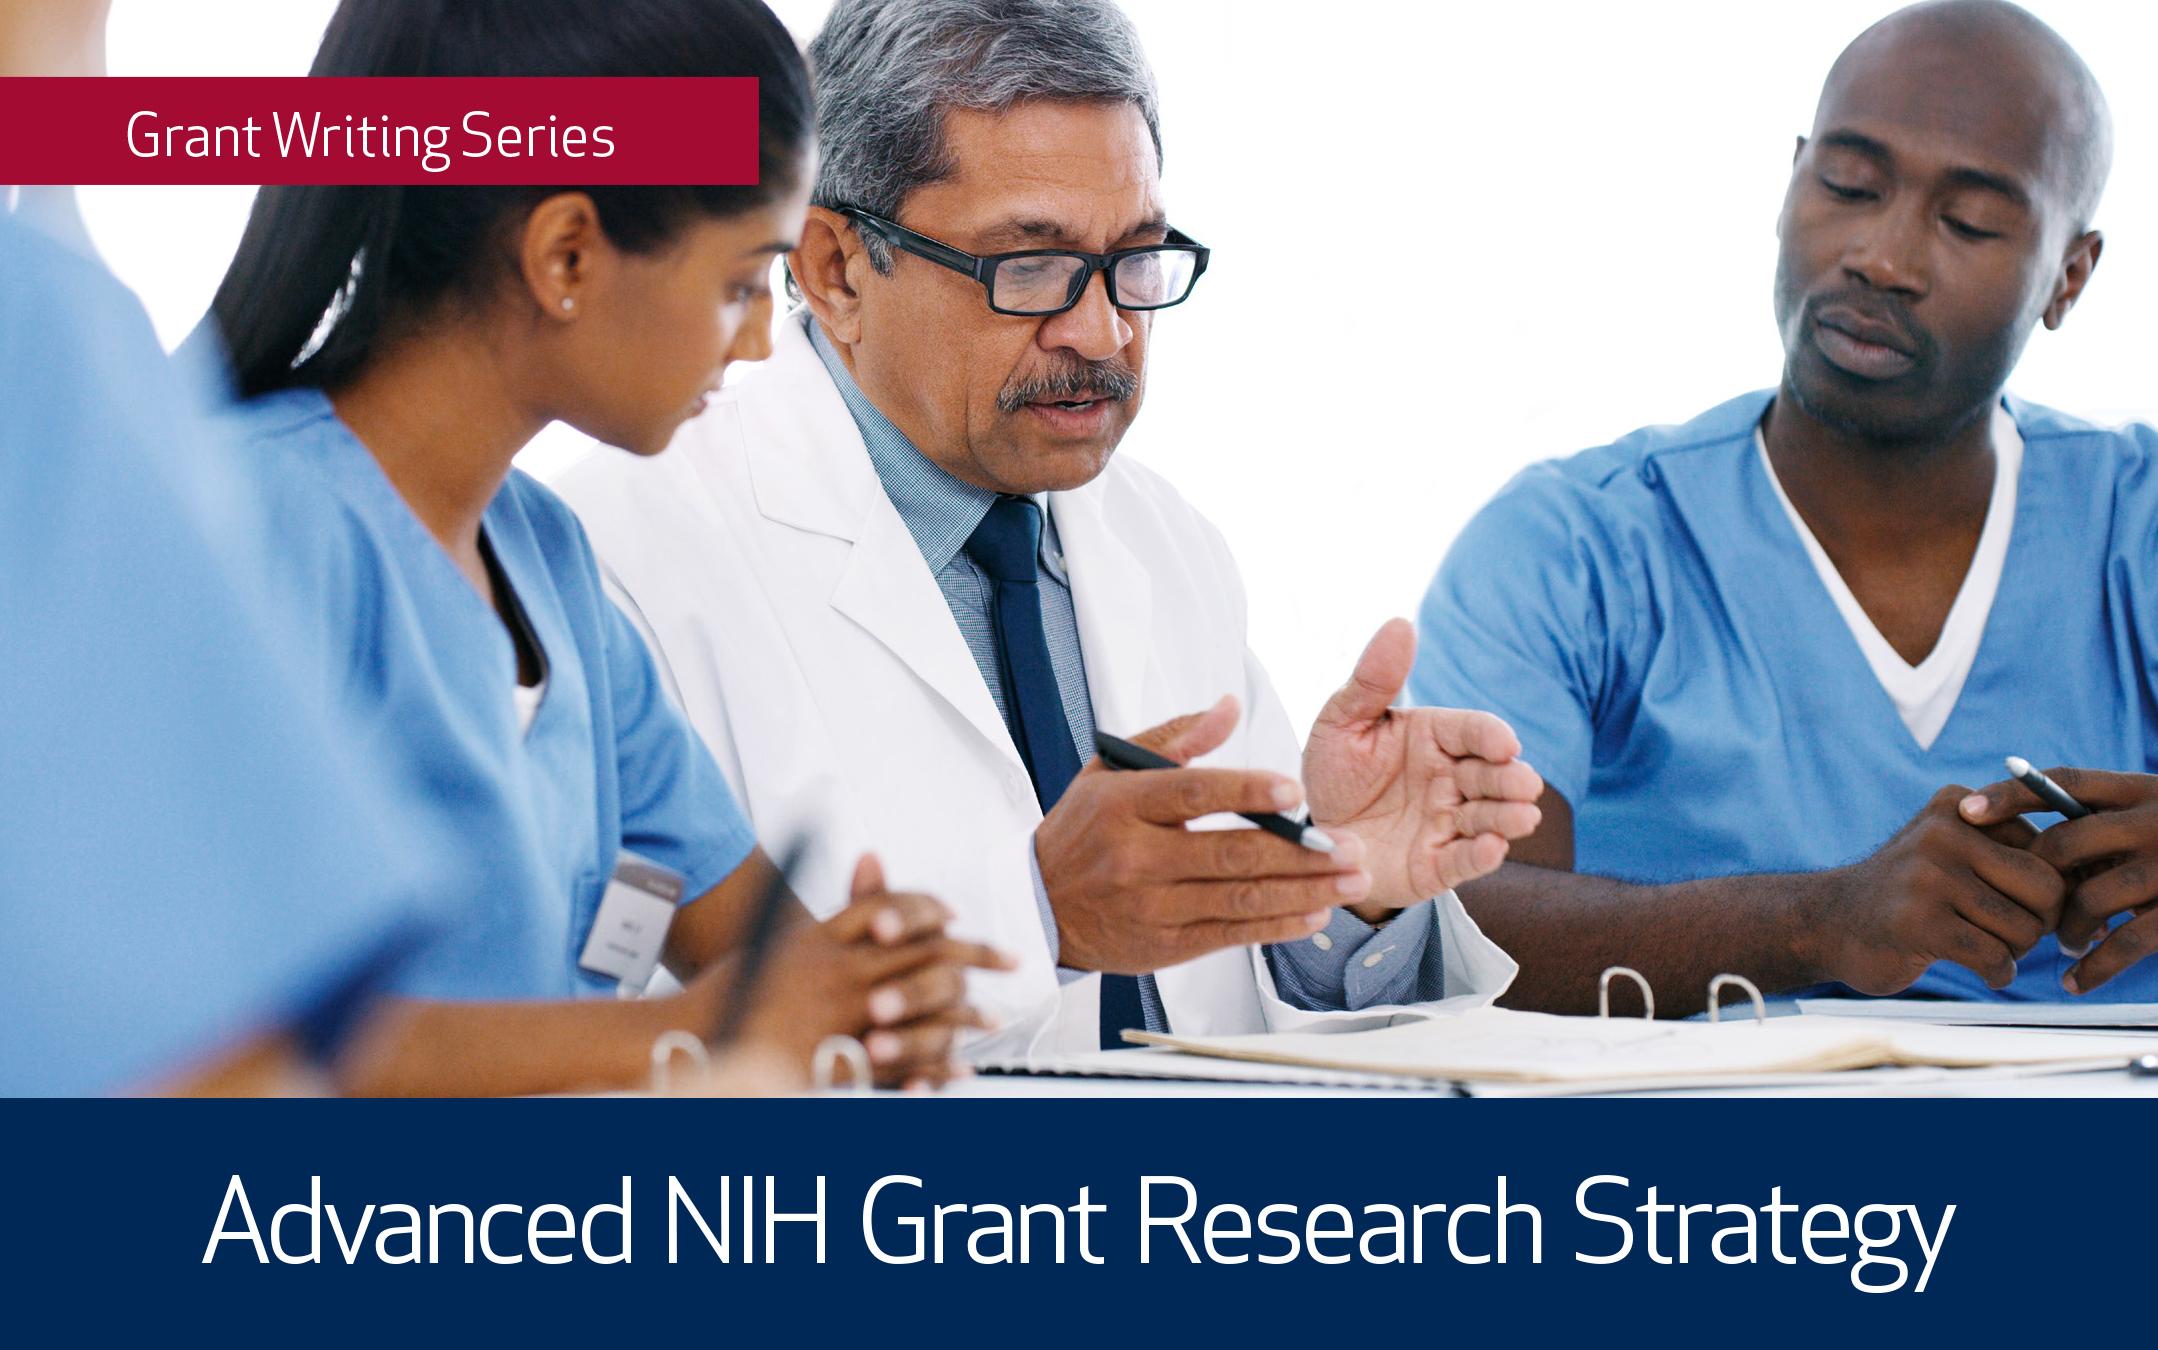 Advanced-NIH-Grant-Research-Strategy_Cvent_518x324